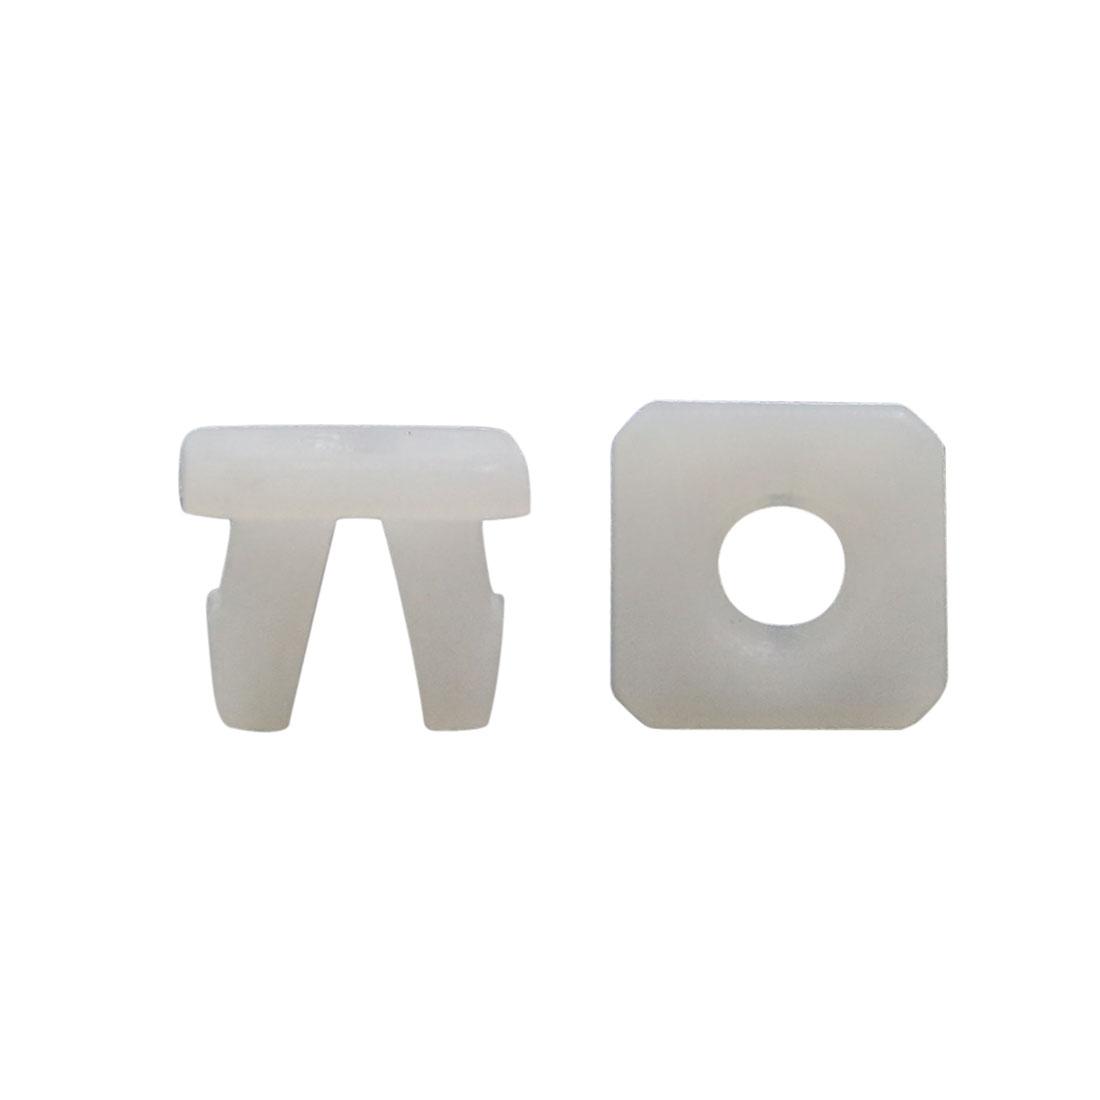 100Pcs White Square Plastic Rivets Fender Fastener Retainer Clips 10 x 7.5mm